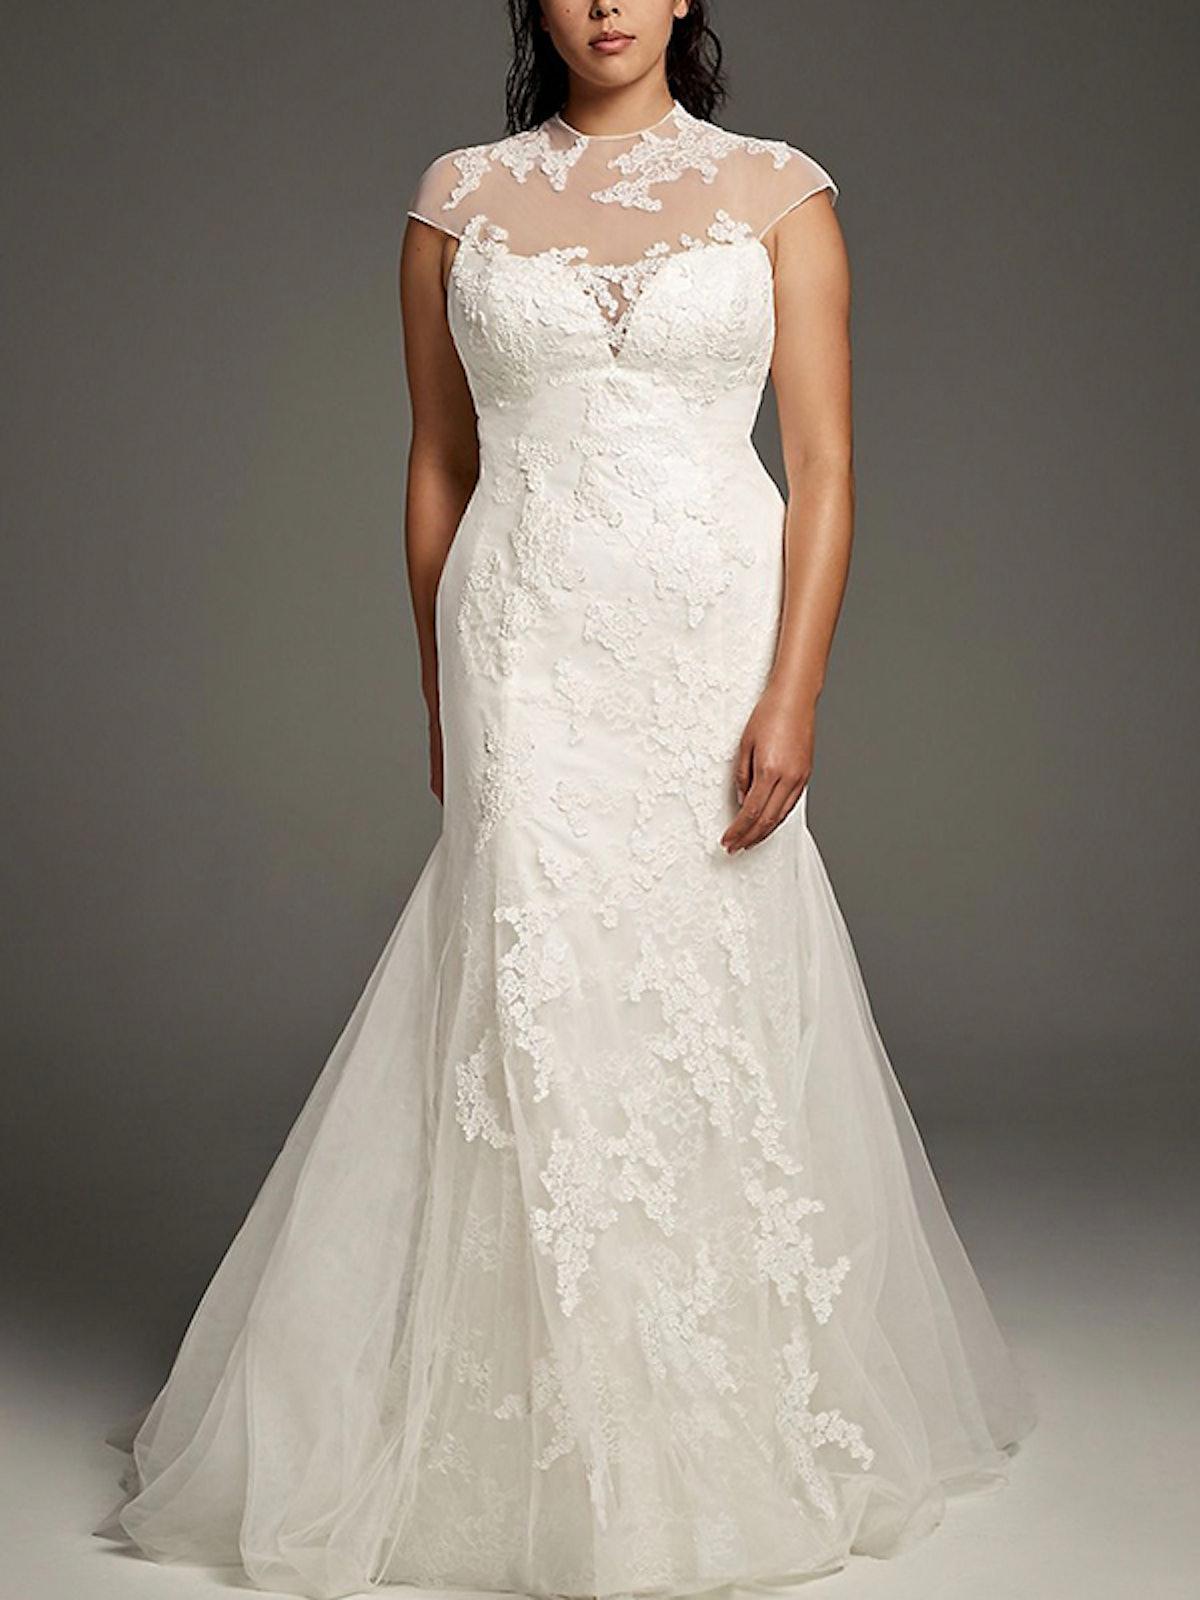 Chantilly Lace Plus Size Trumpet Wedding Dress